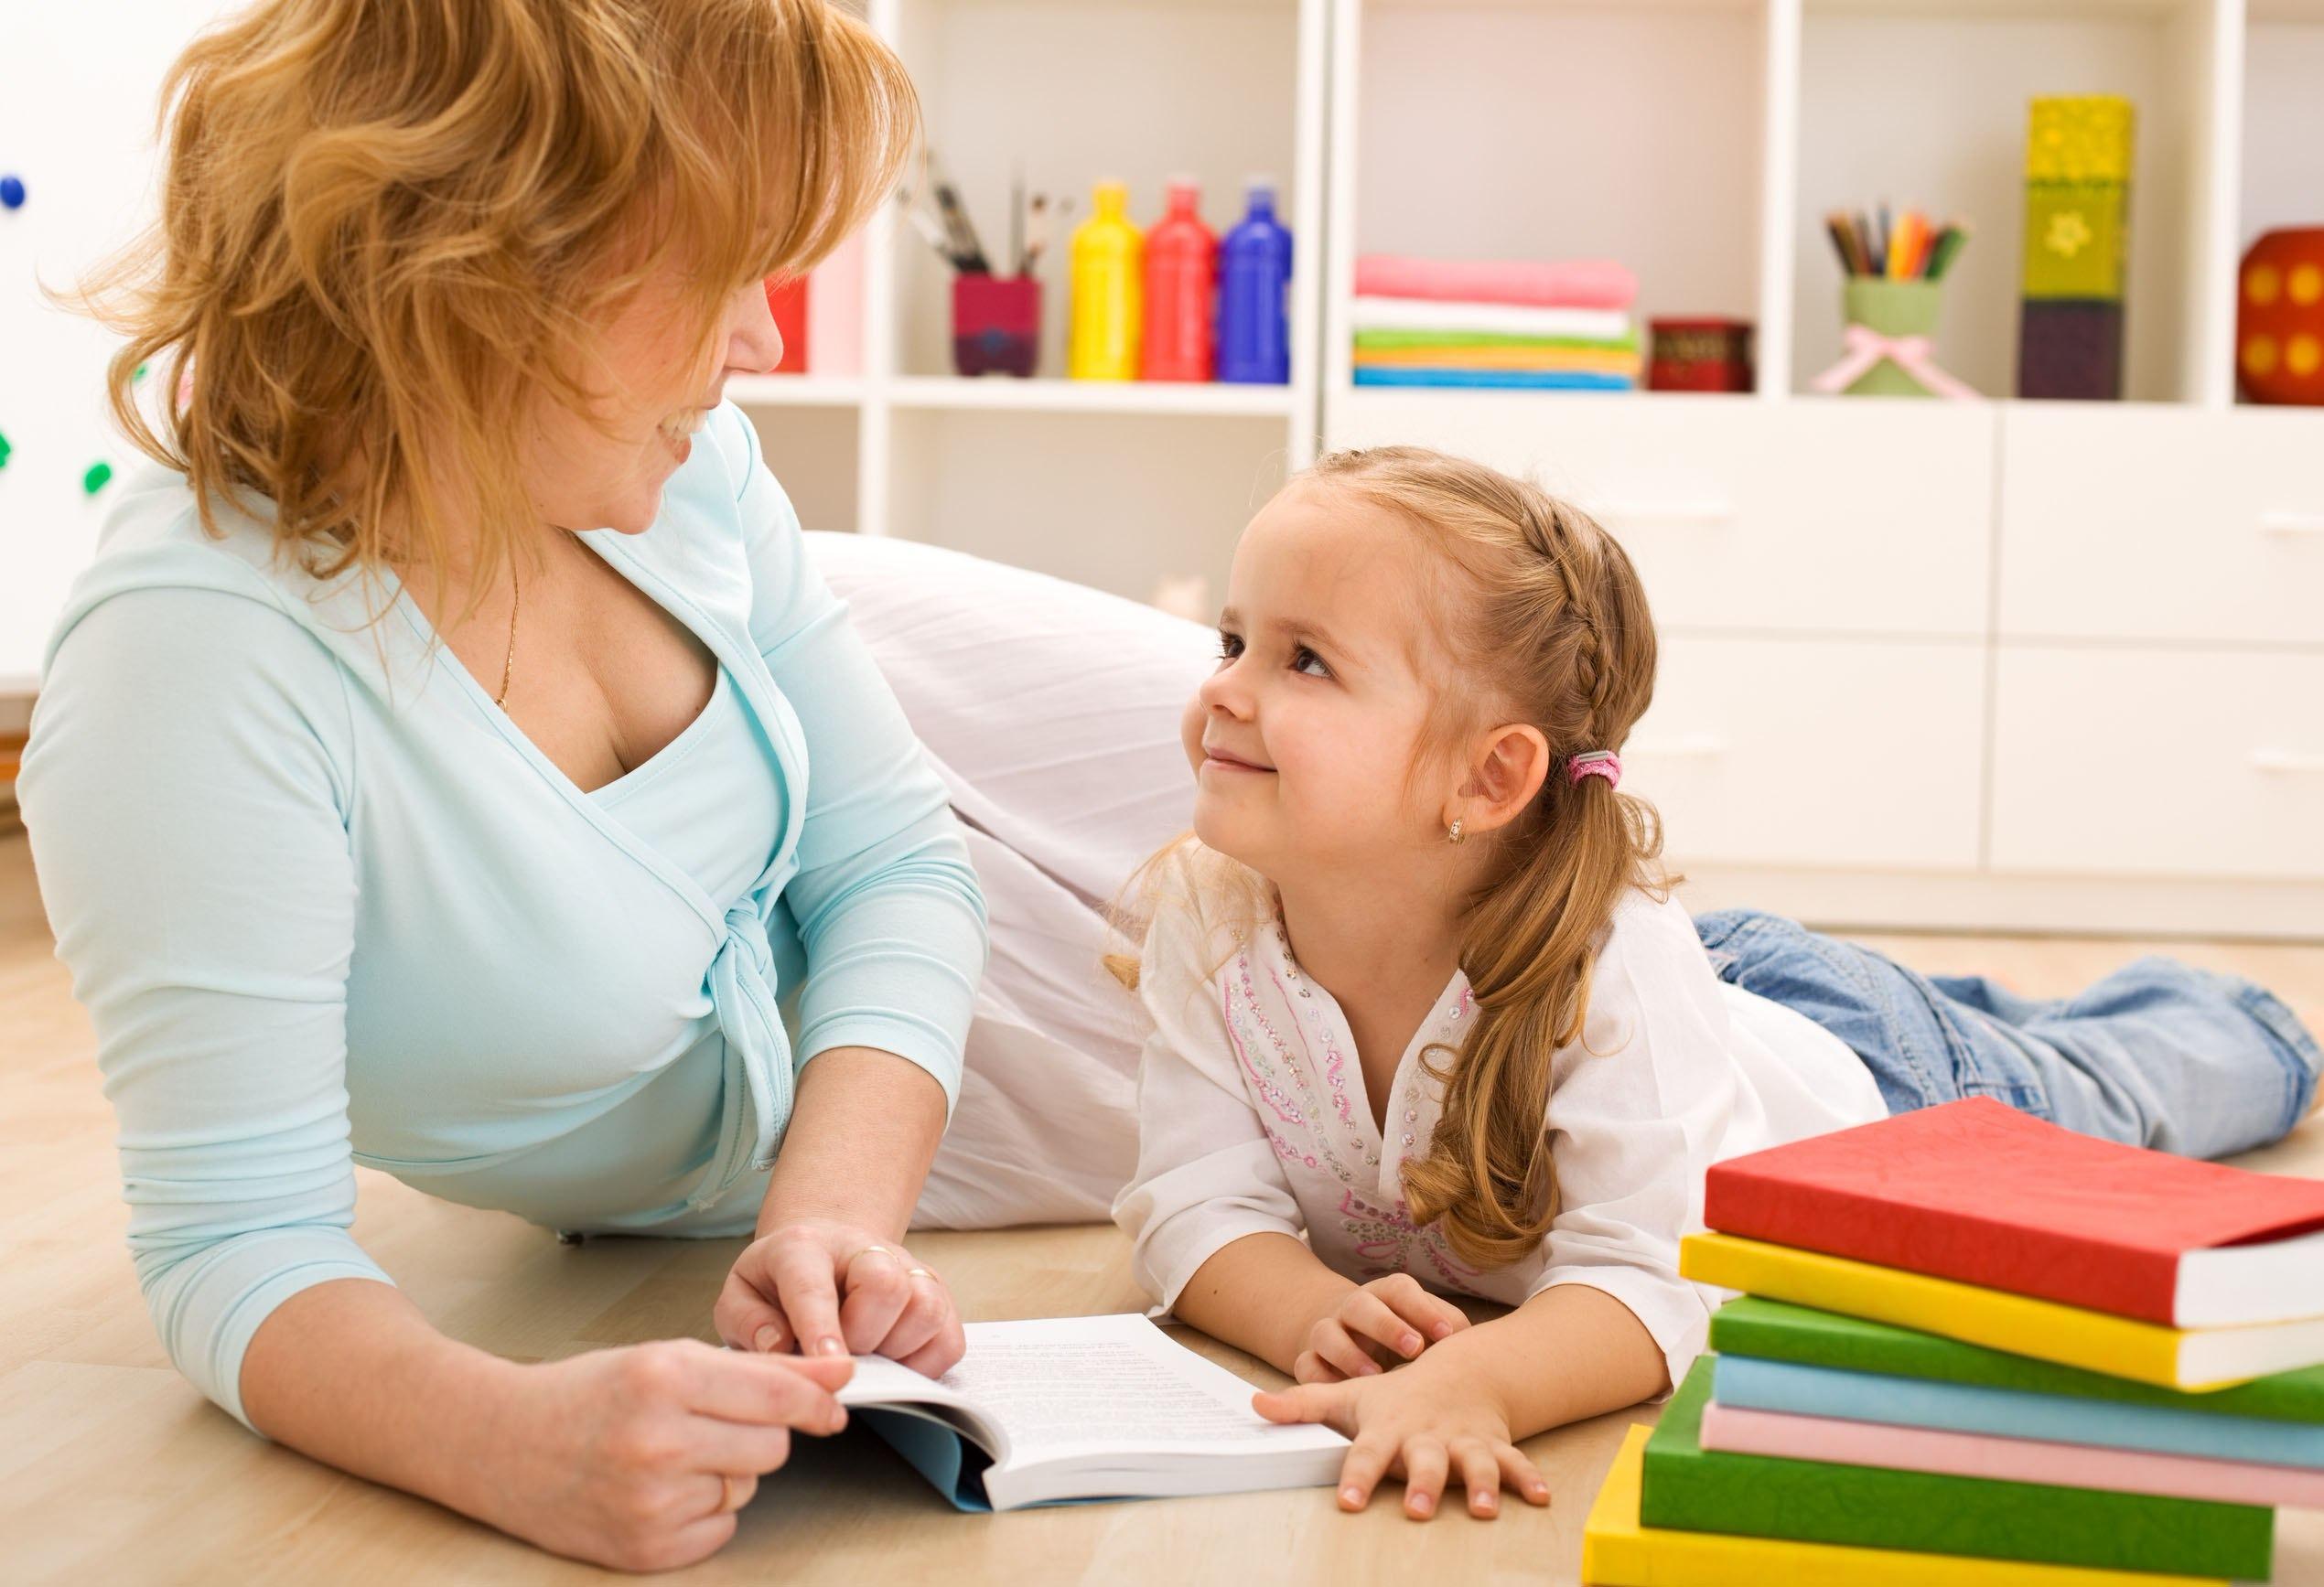 картинки психология воспитания для